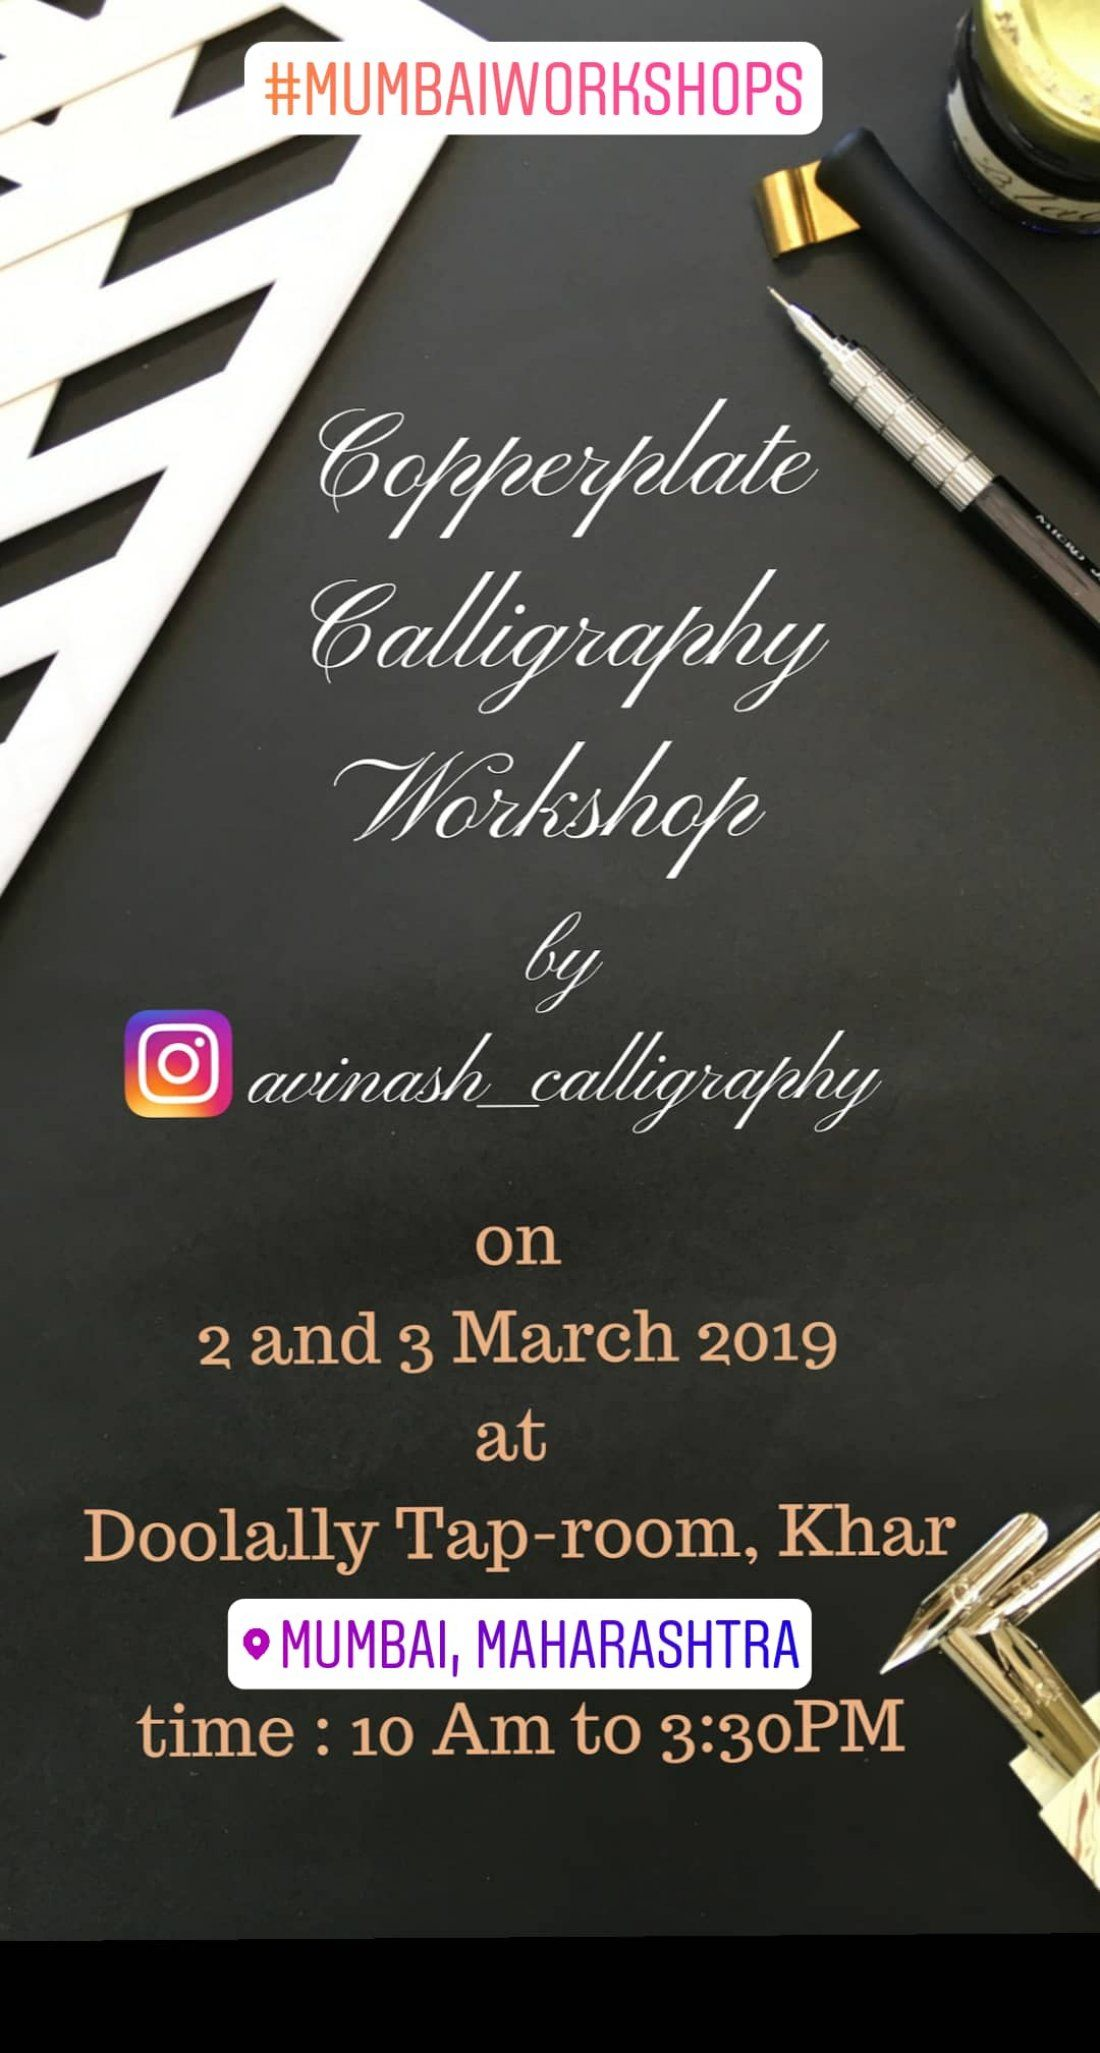 Coppeplate Calligraphy workshop Mumbai